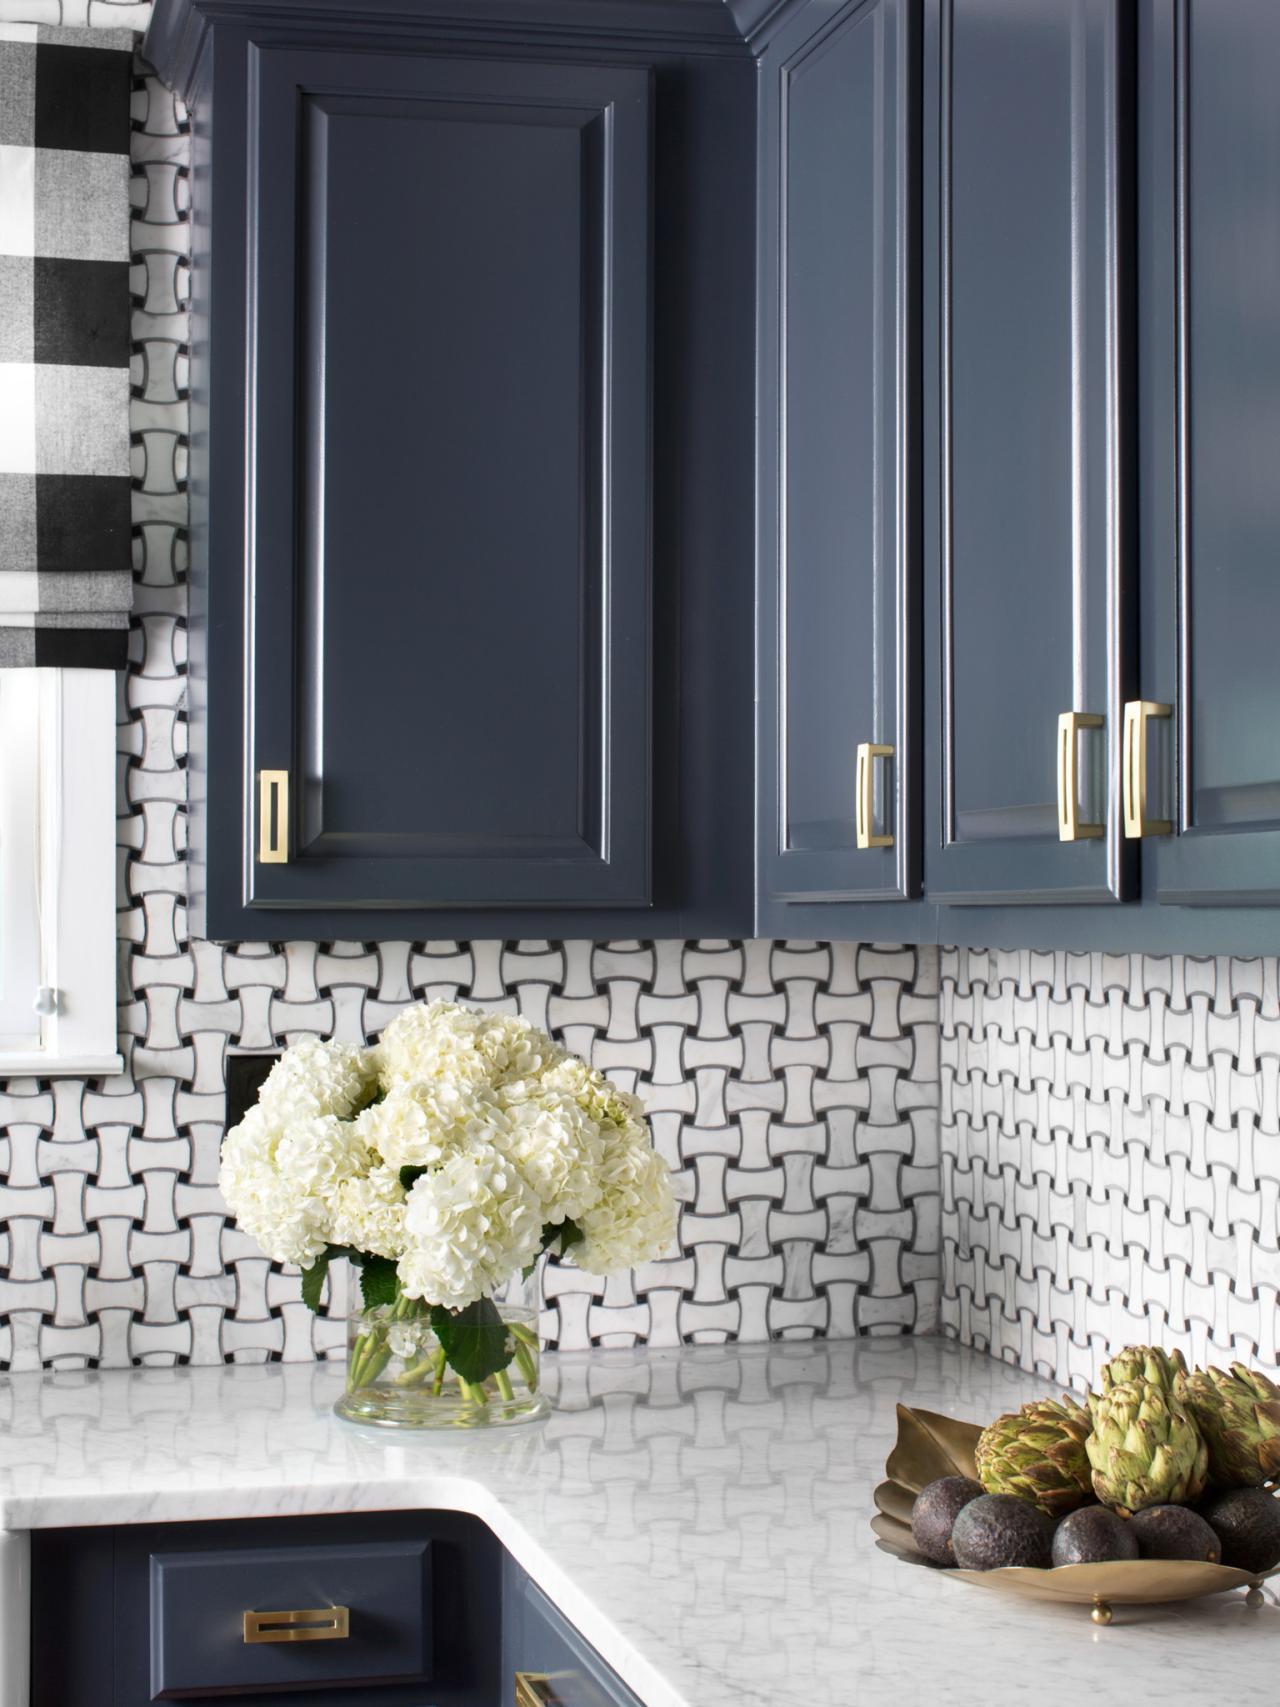 kitchen lighting - Charcoal Grey Kitchen Cabinets